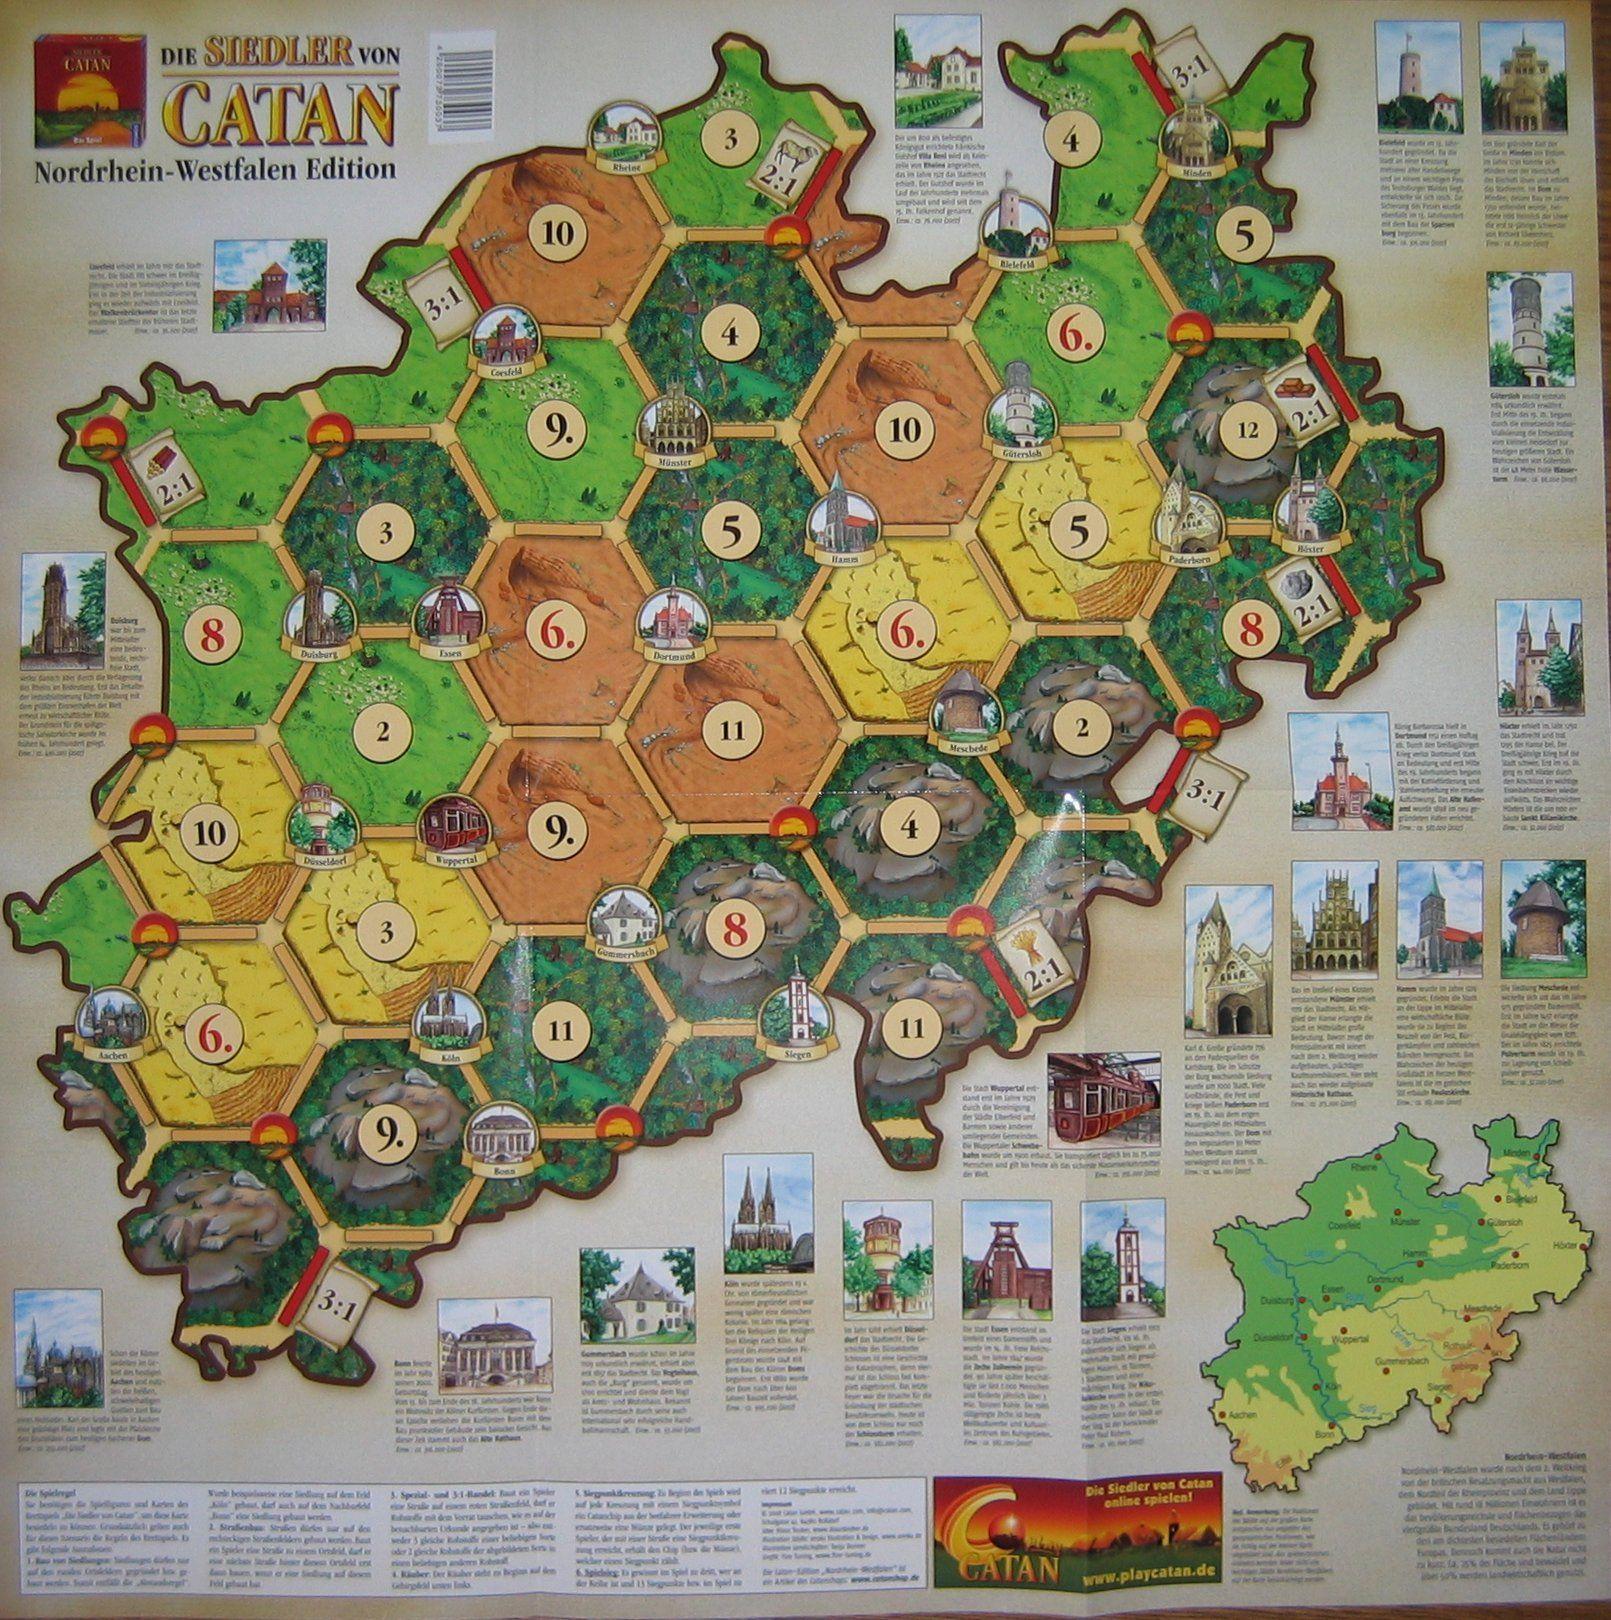 Catan Geographies: North Rhine – Westphalia